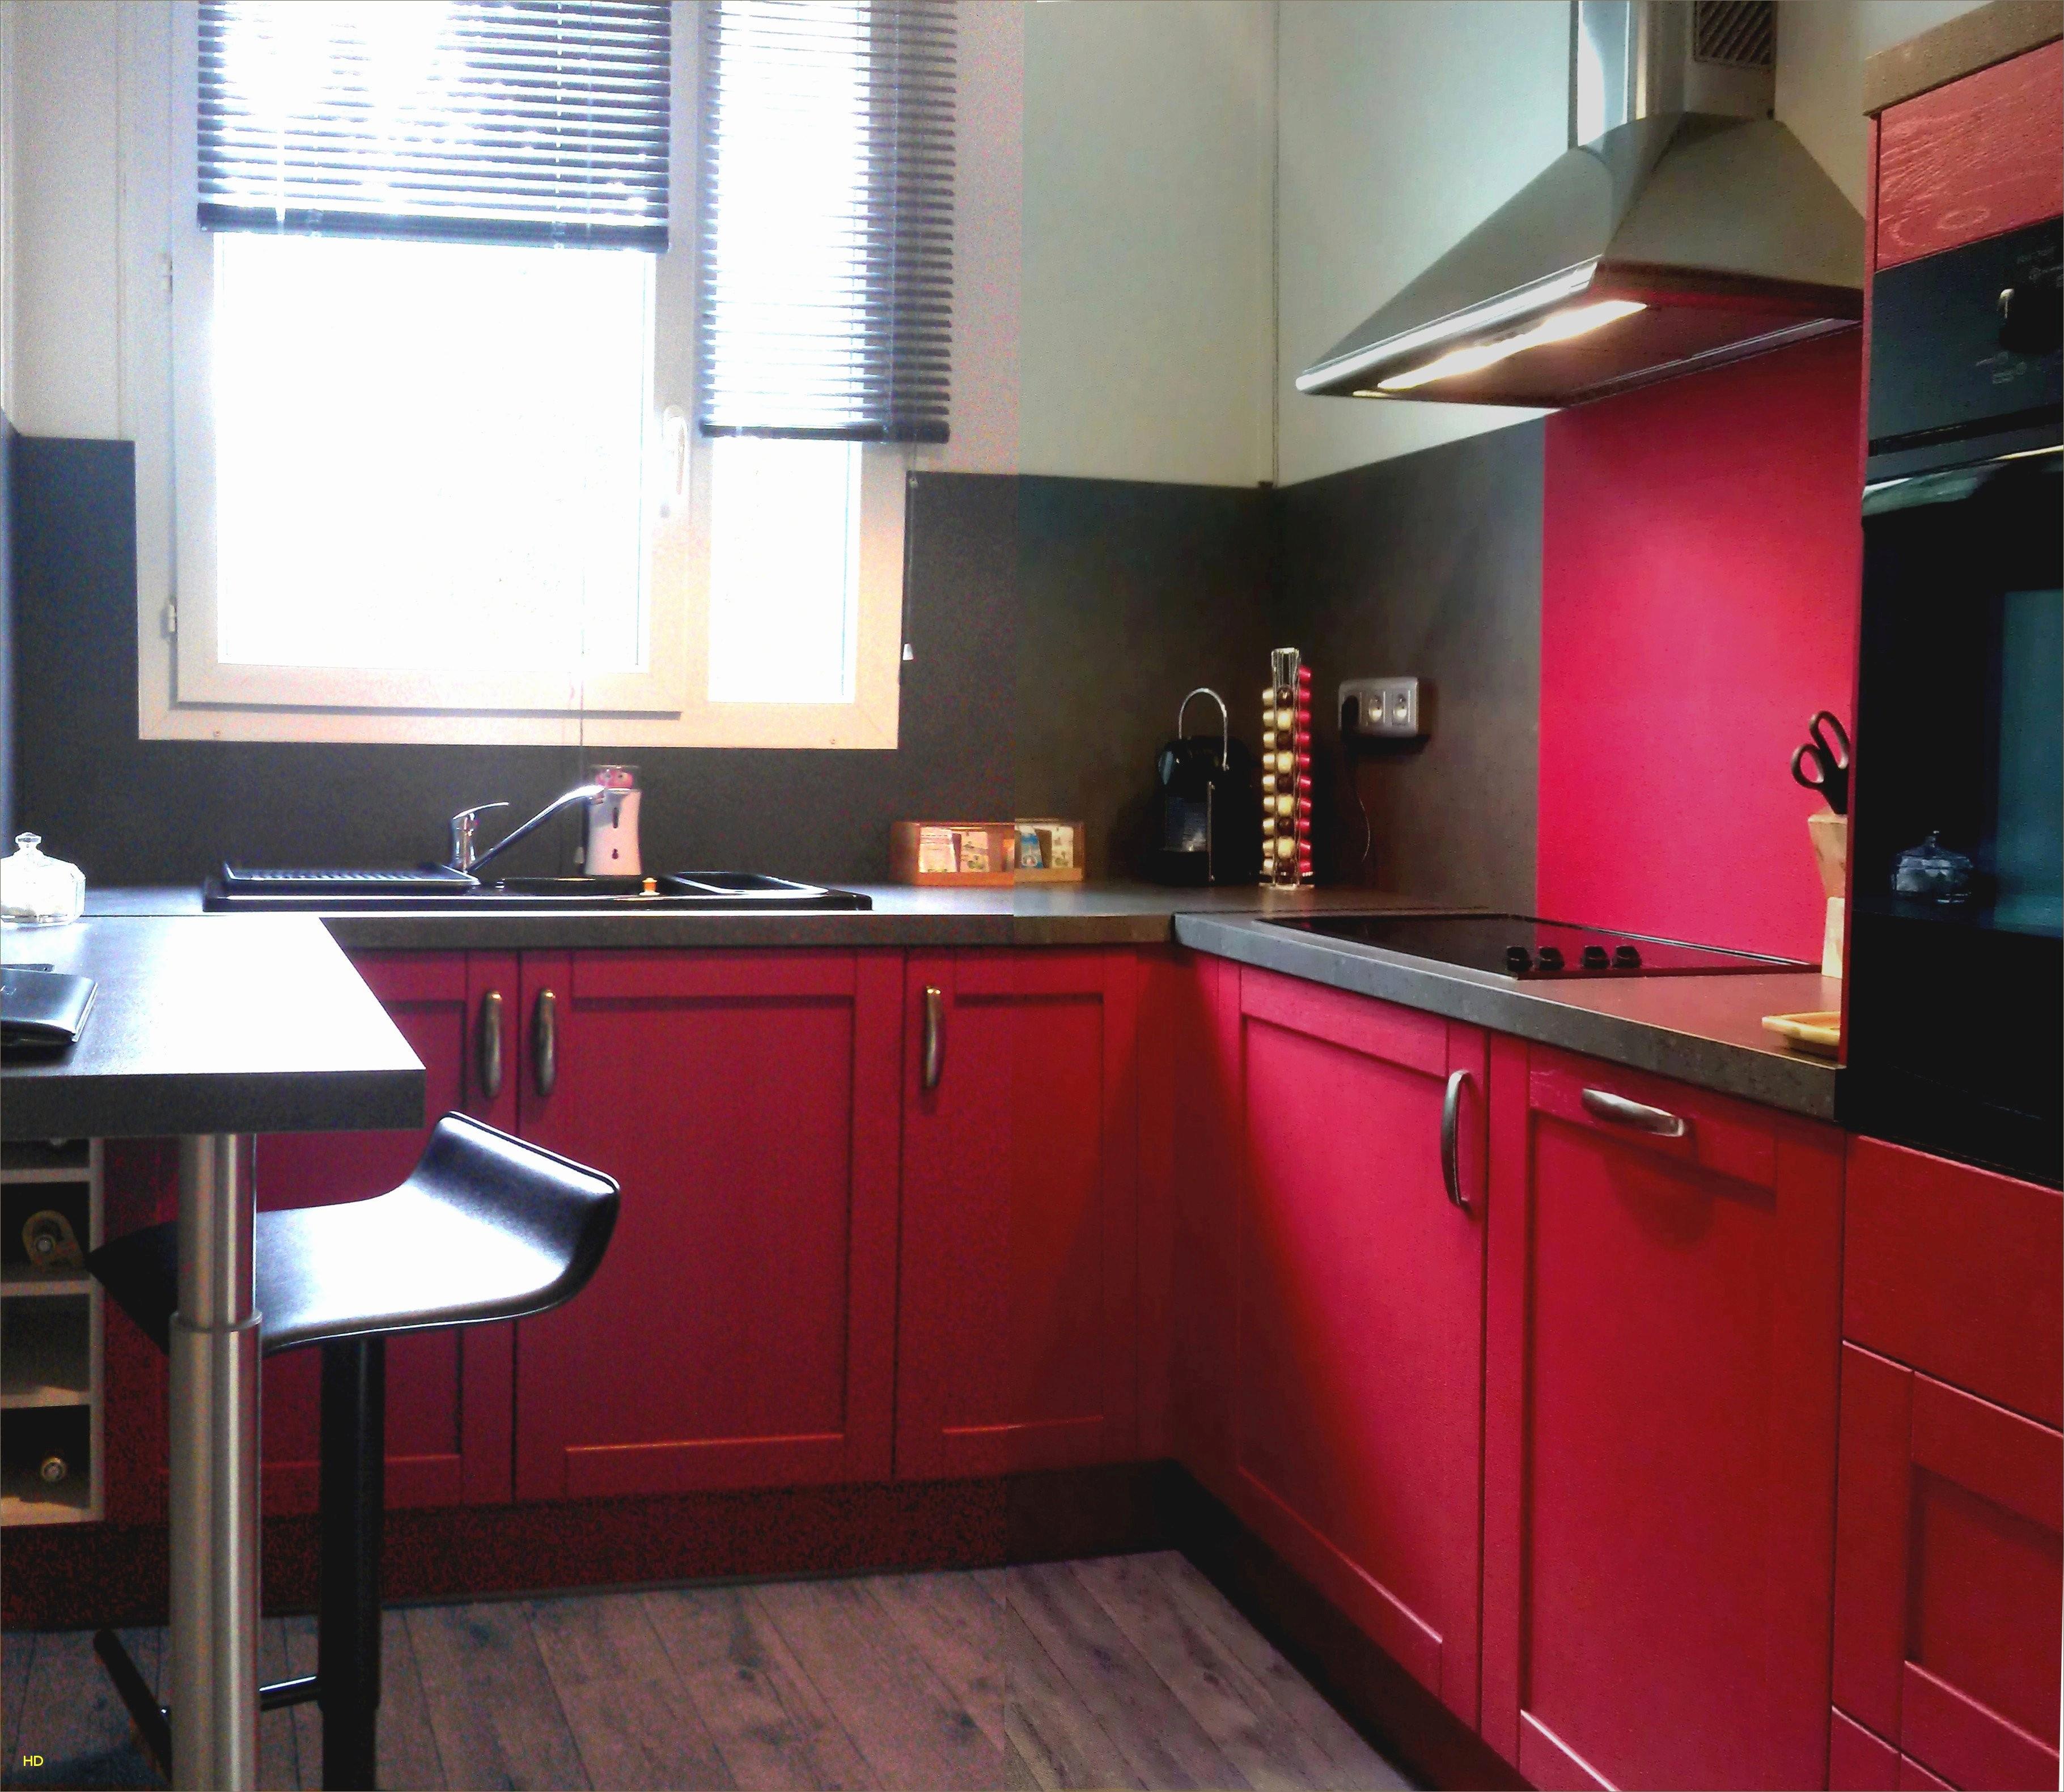 Carrelage 3d Leroy Merlin Impressionnant Stock Cuisine 3d Leroy Beau Stickers Muraux Cuisine Leroy Merlin Maison